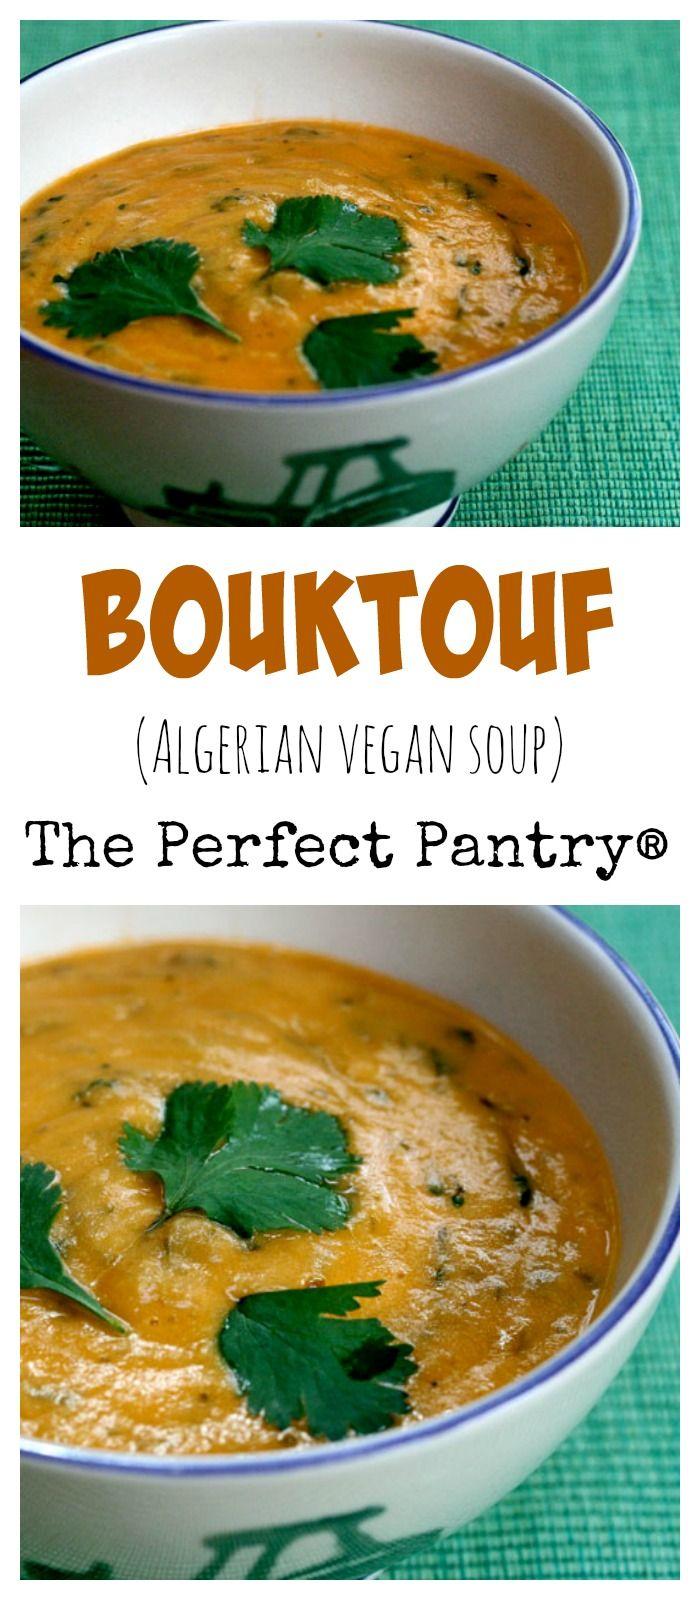 Bouktouf, an Algerian vegetable soup, packs in loads of cilantro. #vegan #meatlessmonday ThePerfectPantry.com